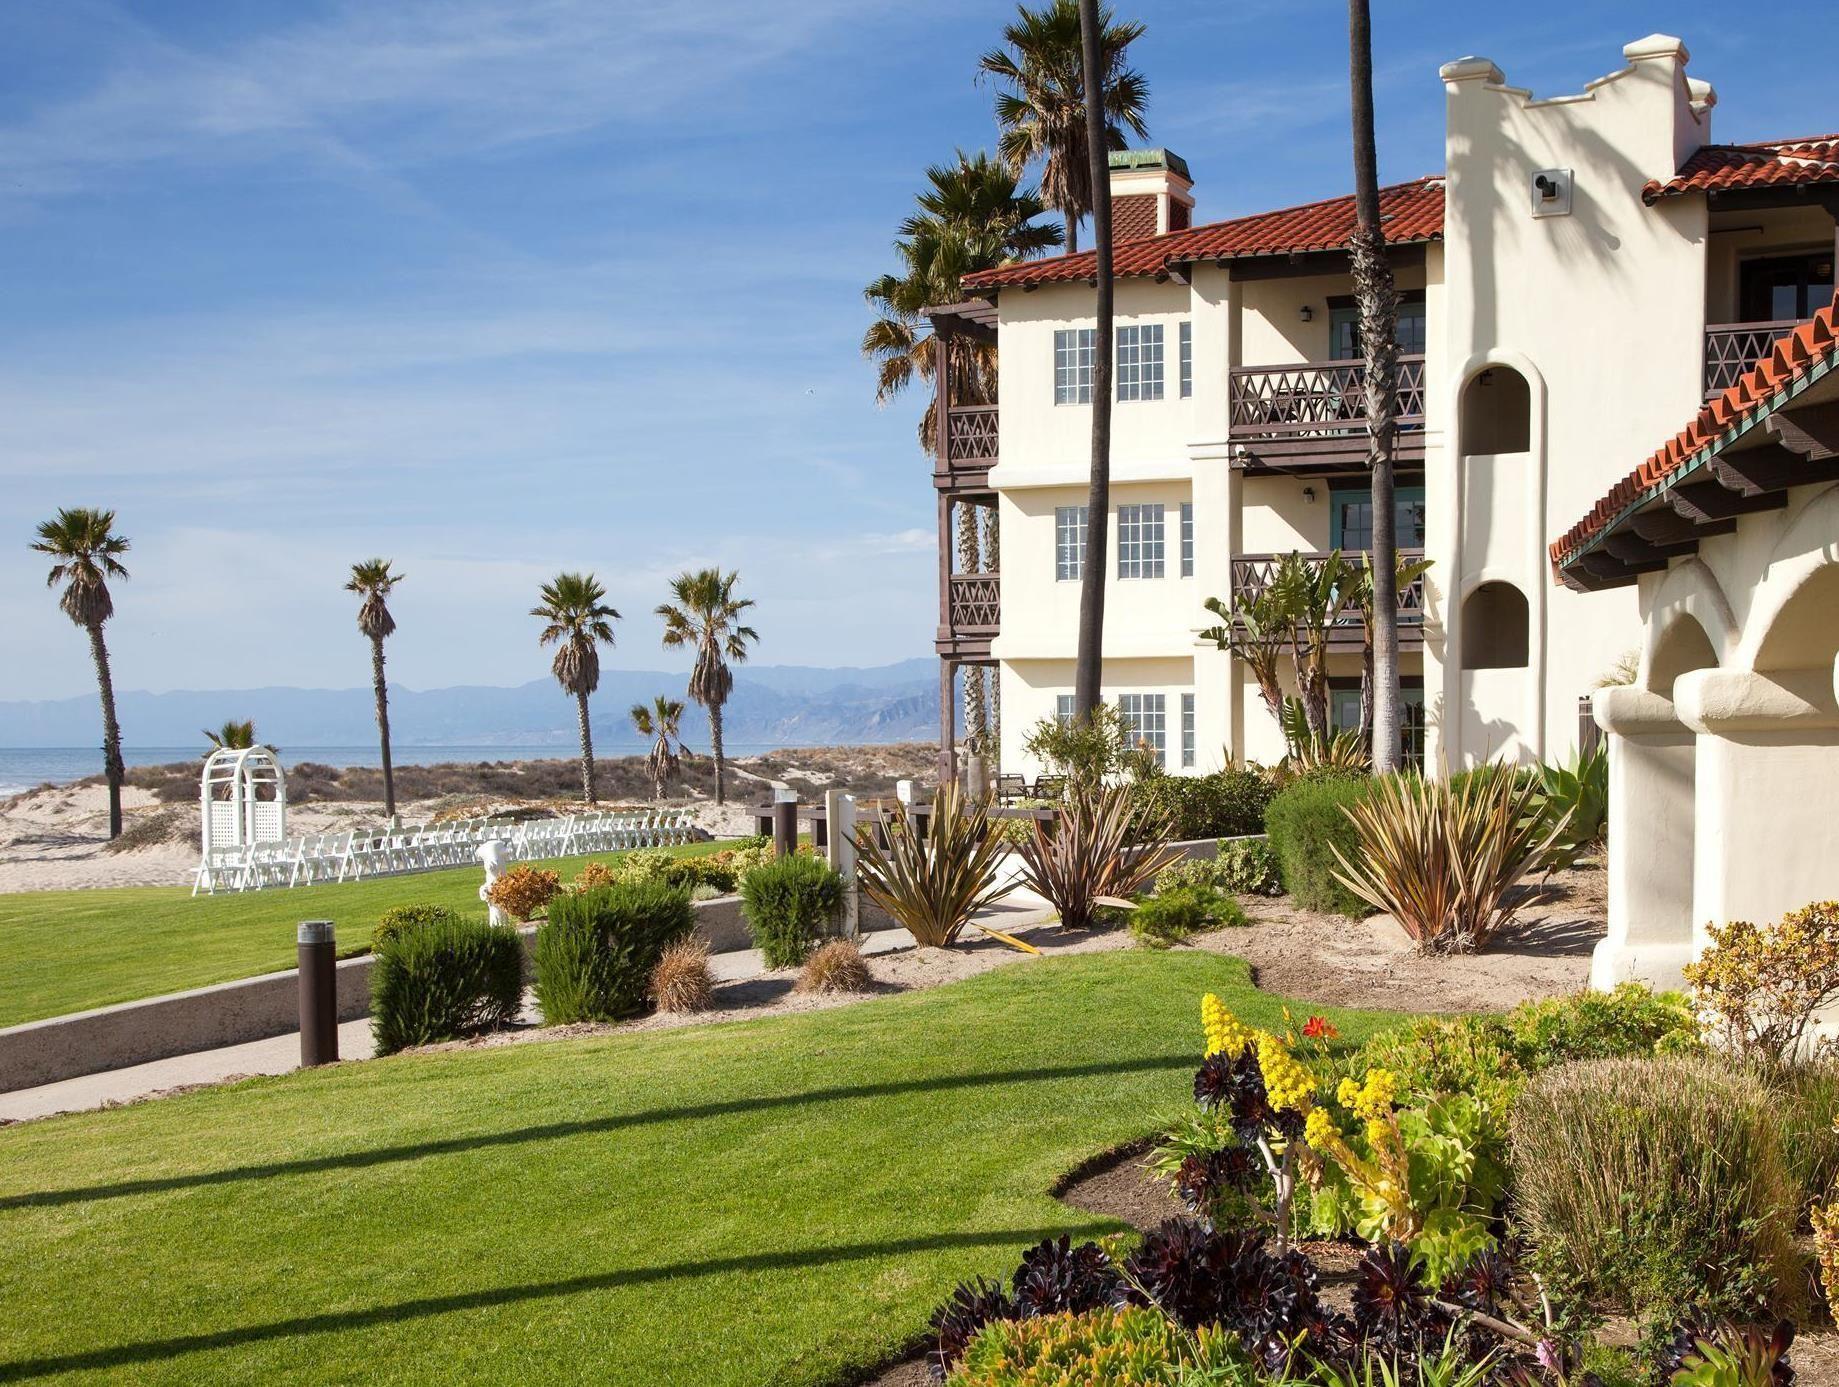 Oxnard (CA) Embassy Suites Mandalay Beach Hotel And Resort